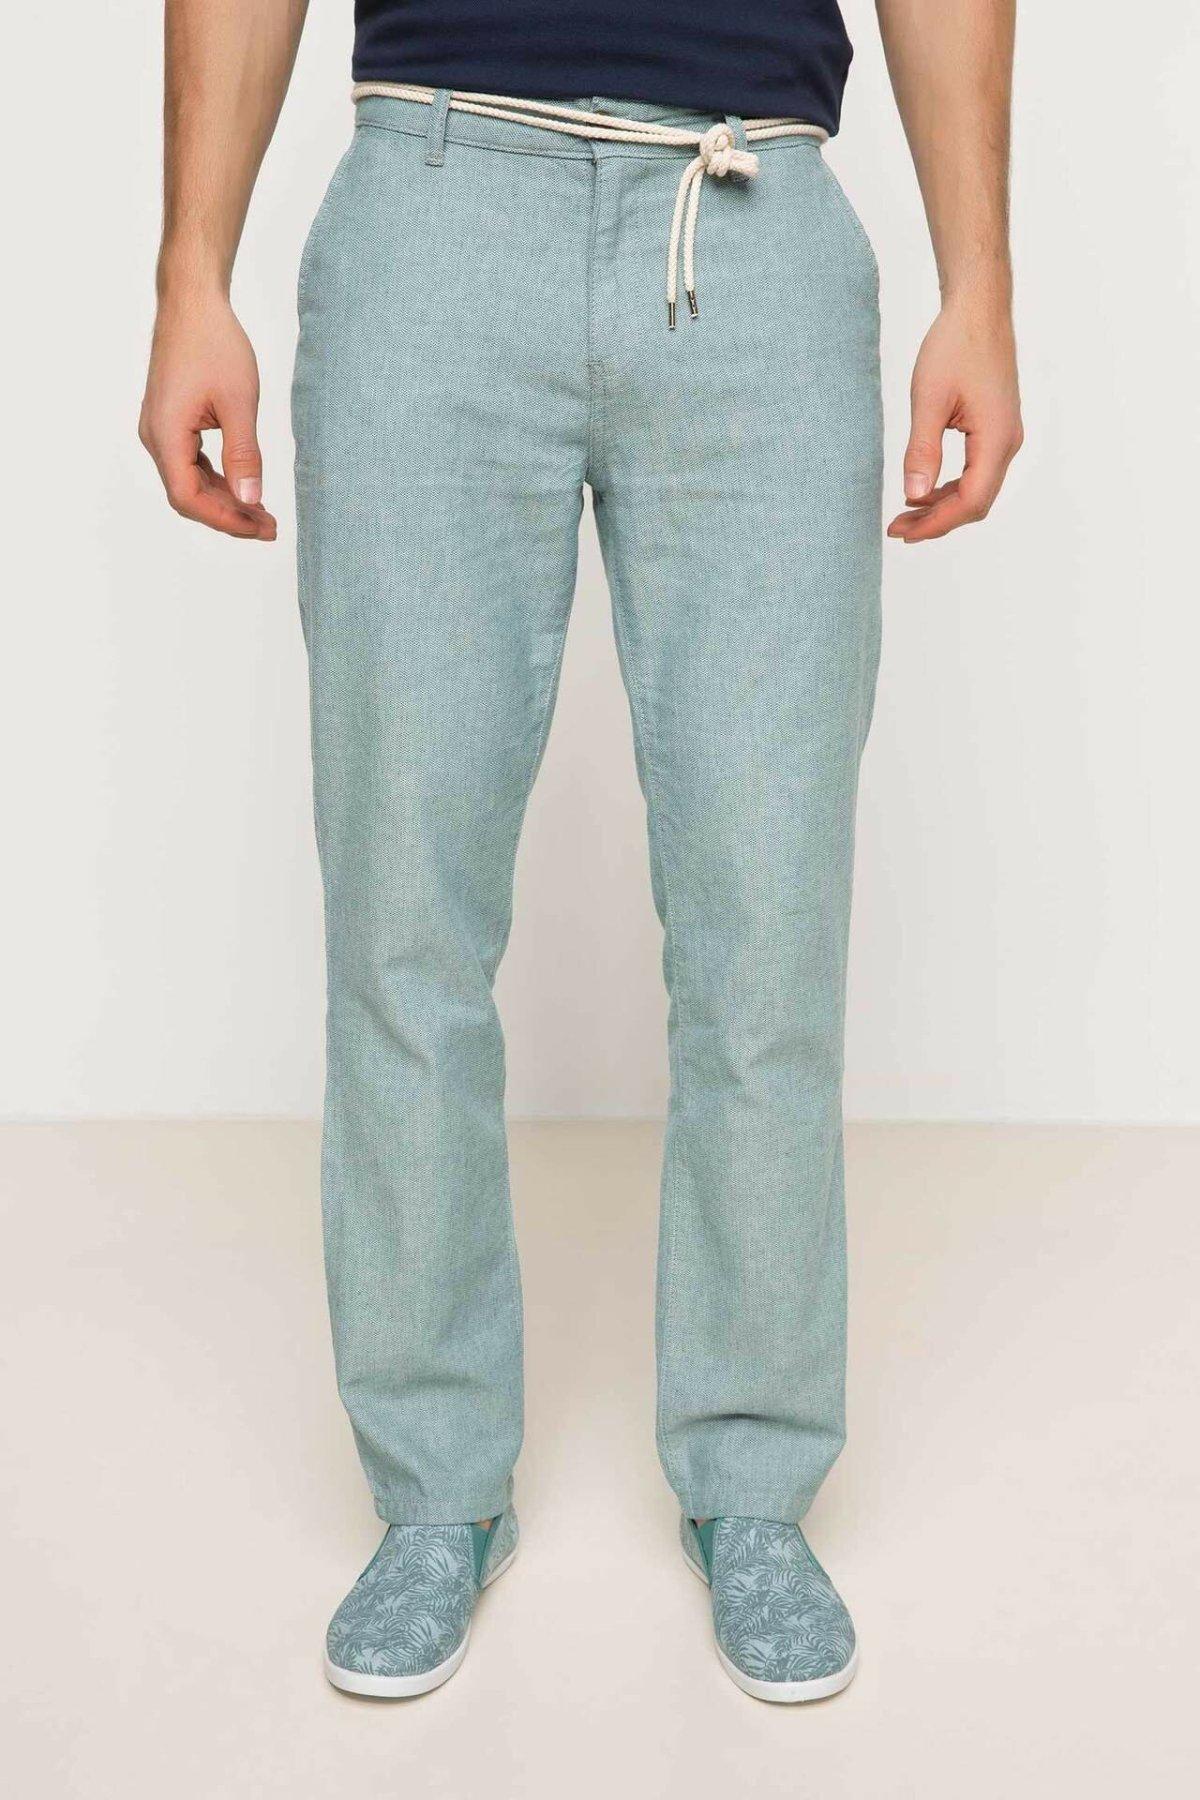 DeFacto New Man Trousers Business Straight Long Pants Mid-waist Men's Bottoms Pockets Long Pants New Blue -G8948AZ17HS